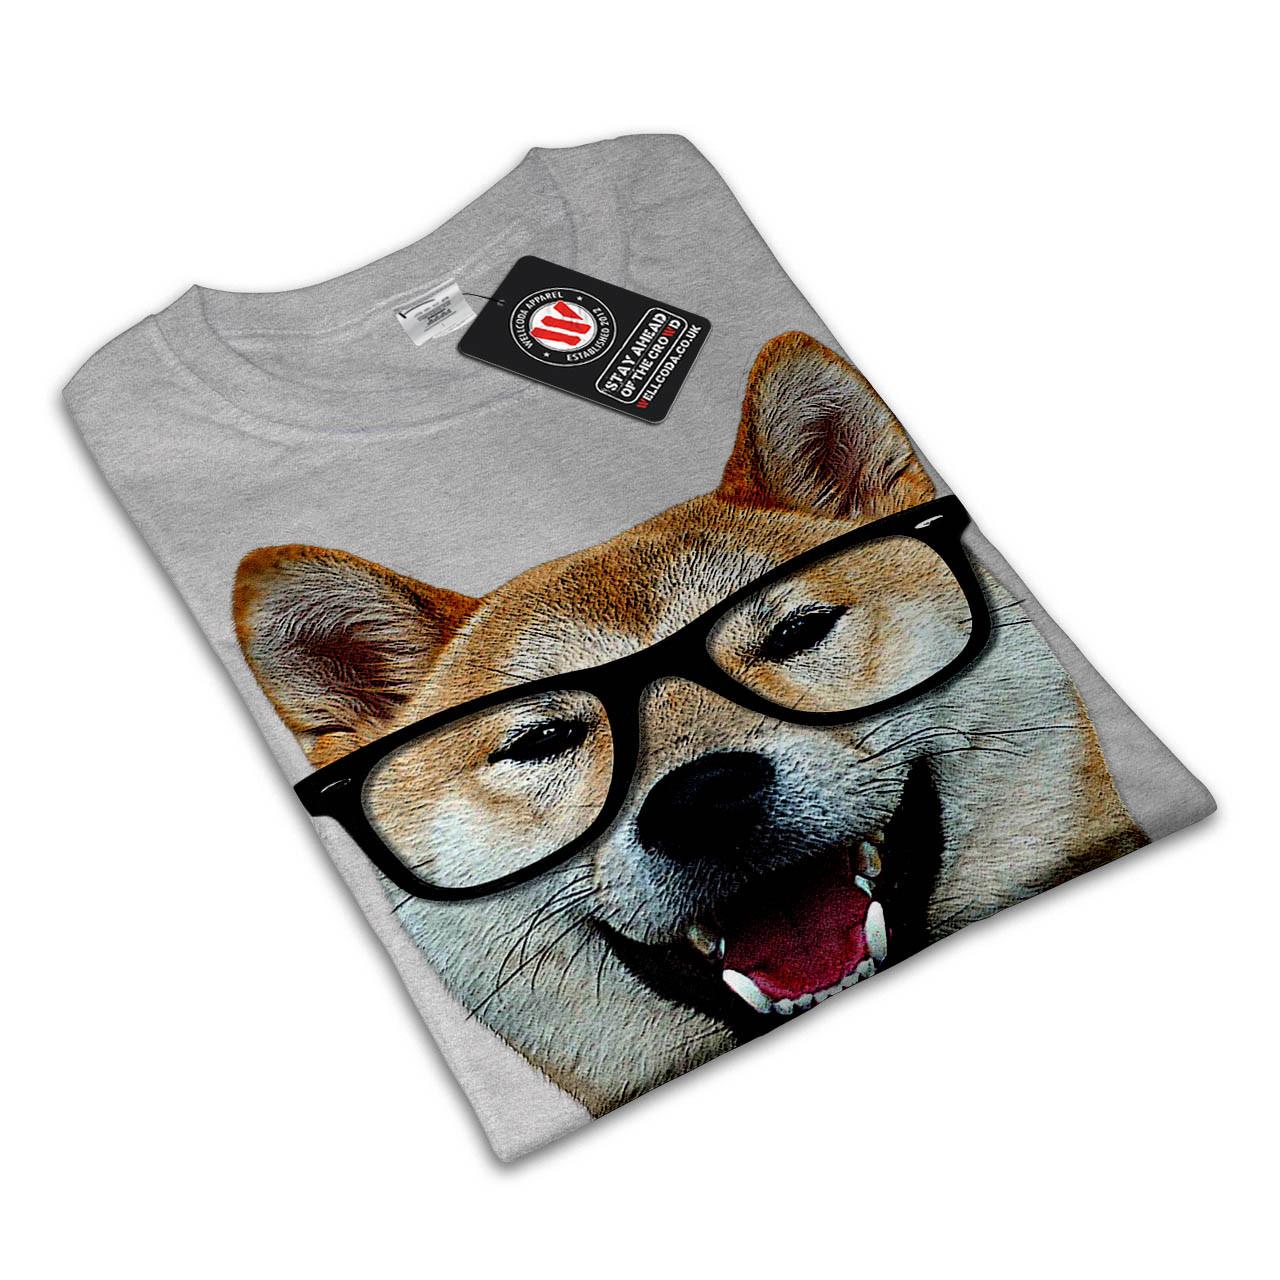 smart-shiba-inu-dog-t-shirt-design